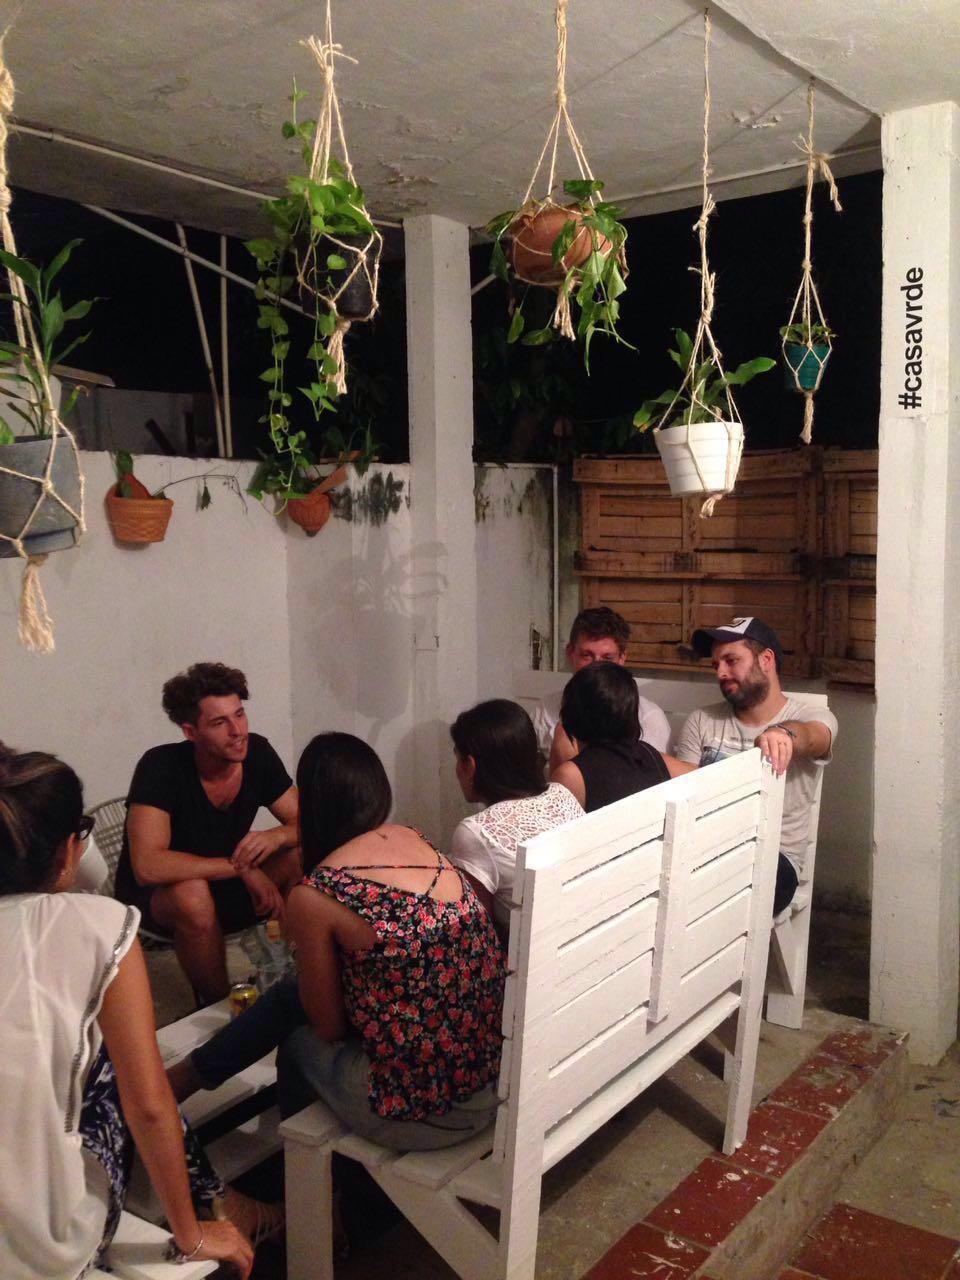 STUDENT ROOM IN BARRANQUILLA